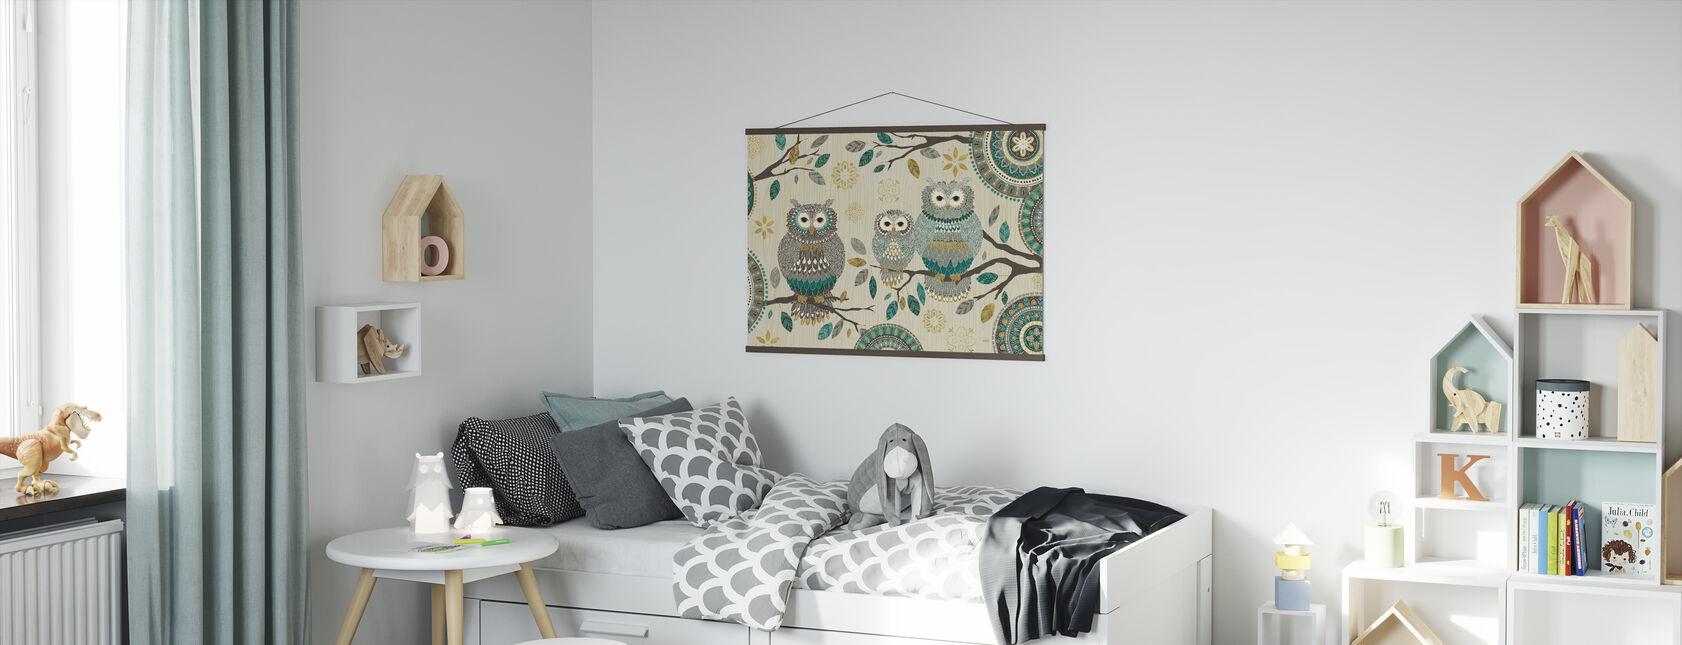 Pöllö Trio - Juliste - Lastenhuone